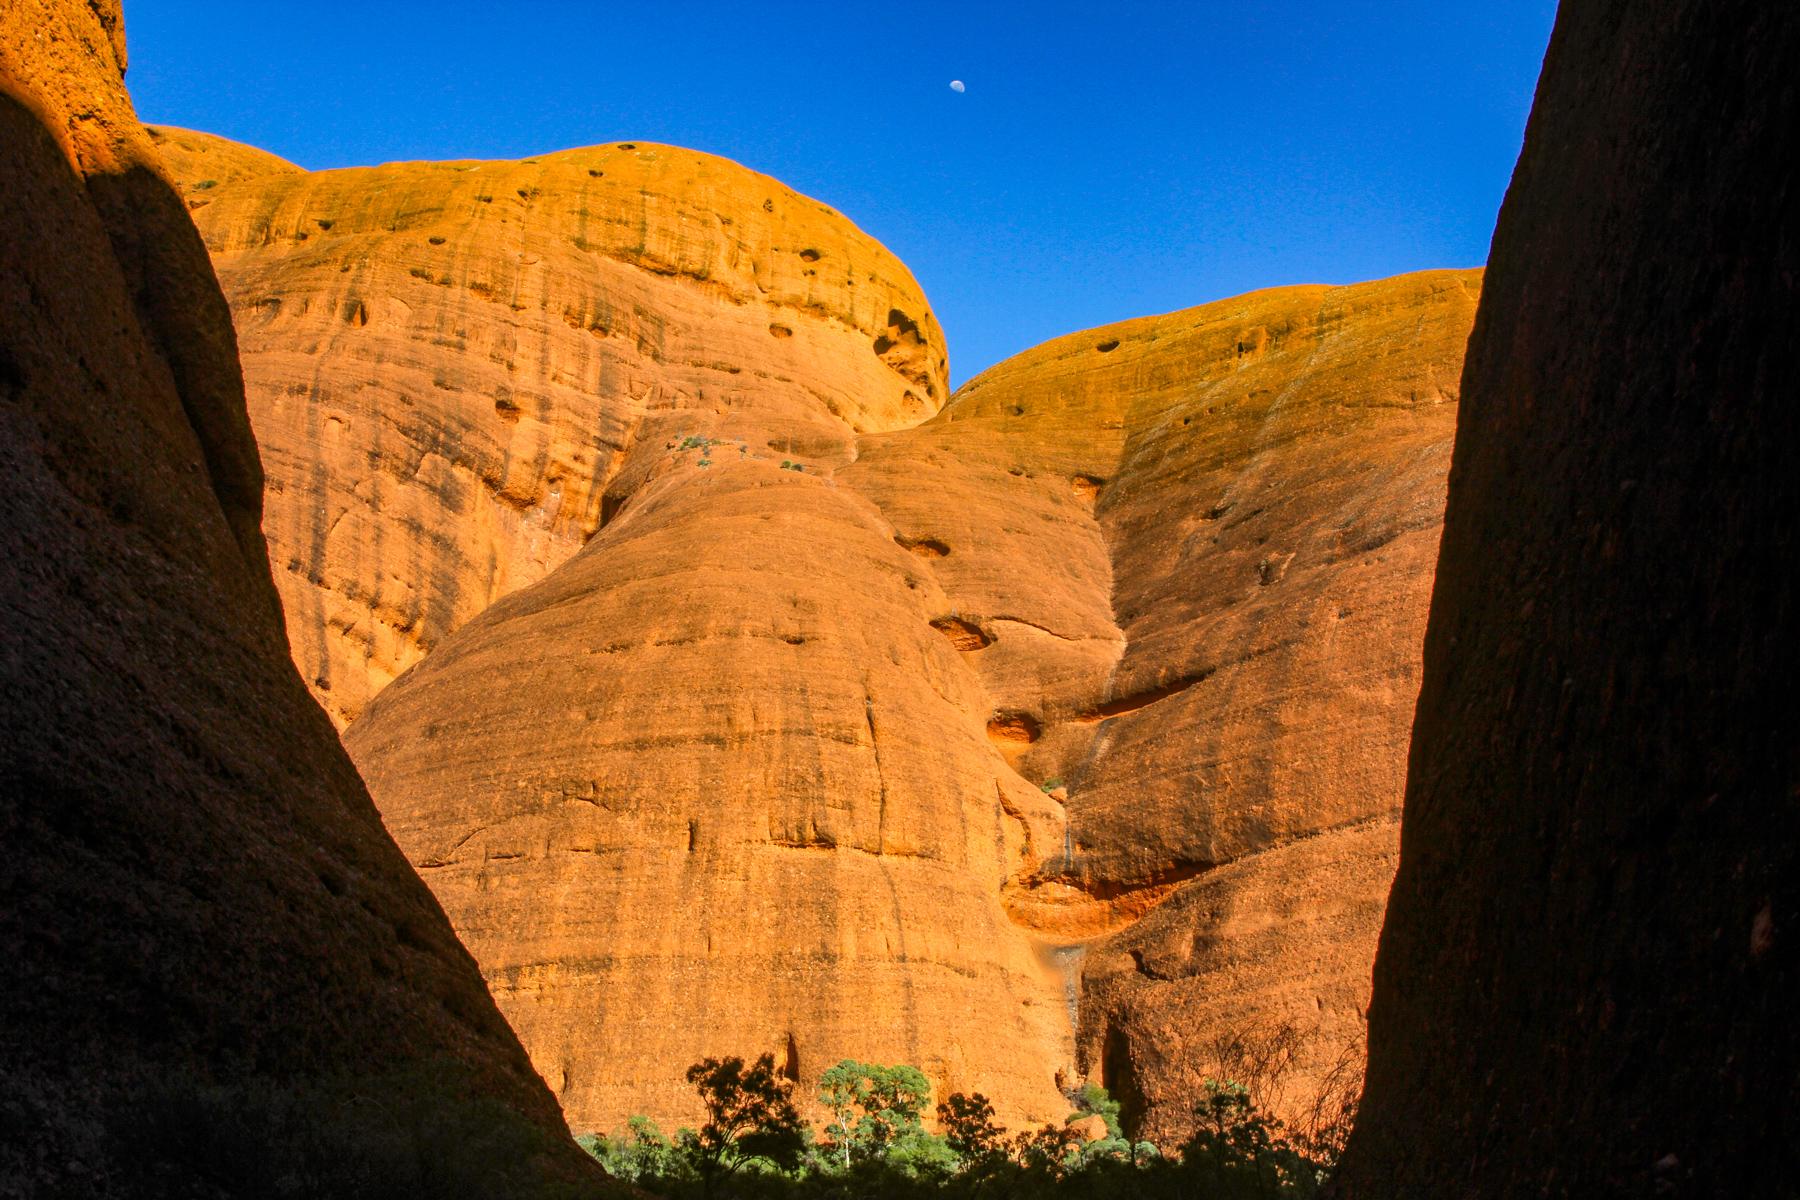 mg 1491 lr What to do in Uluru